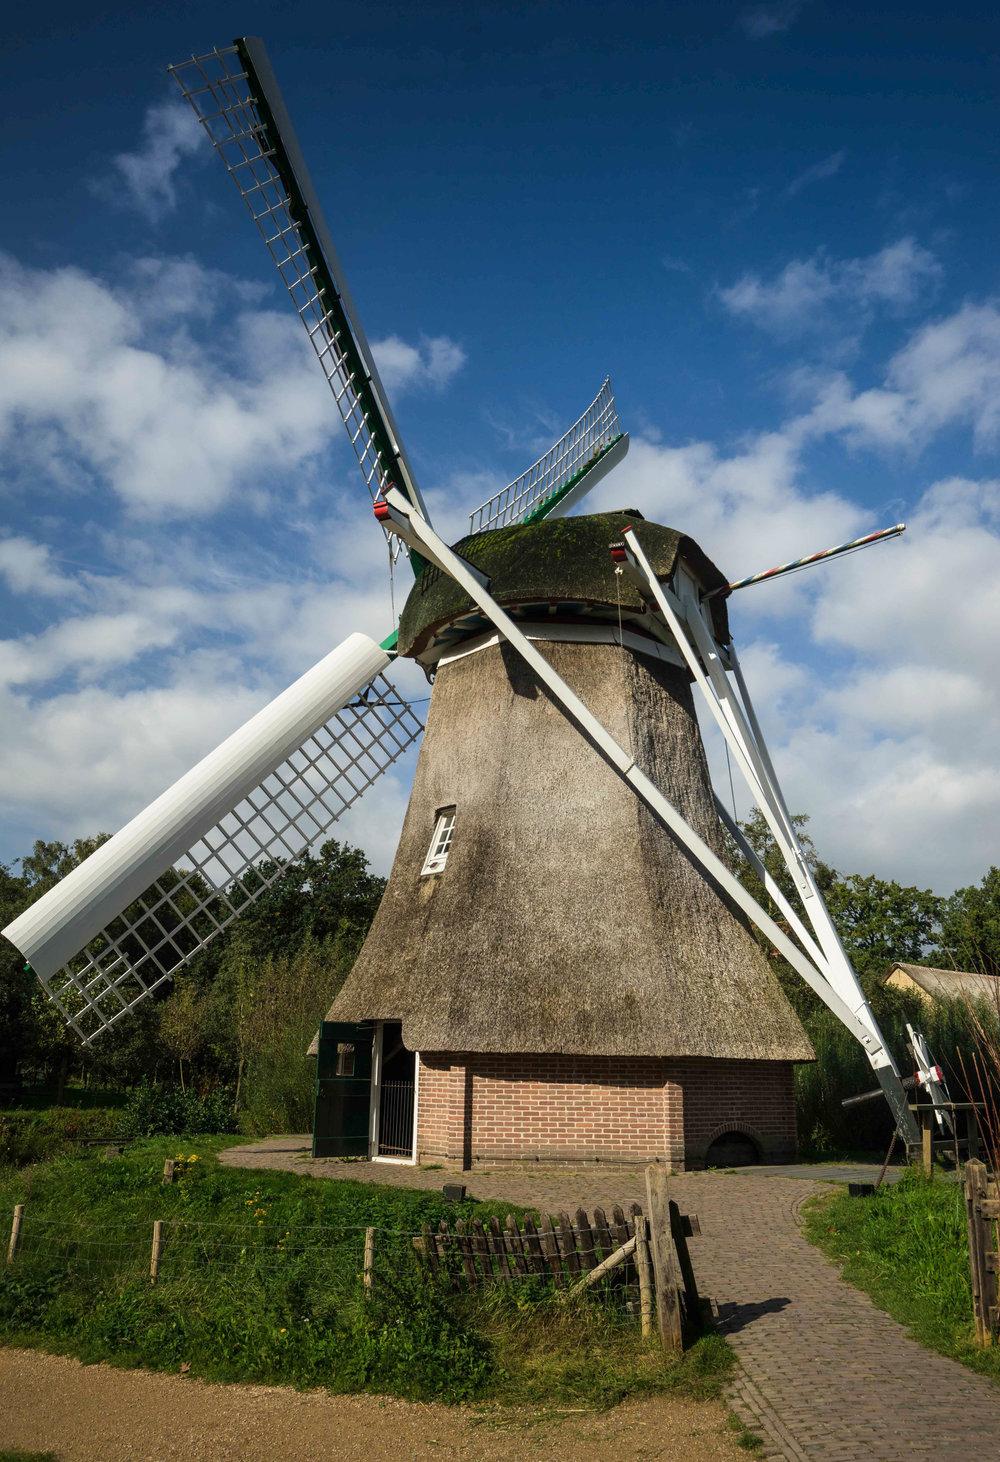 Nederland 10-01-2017 Dev LR-107.jpg